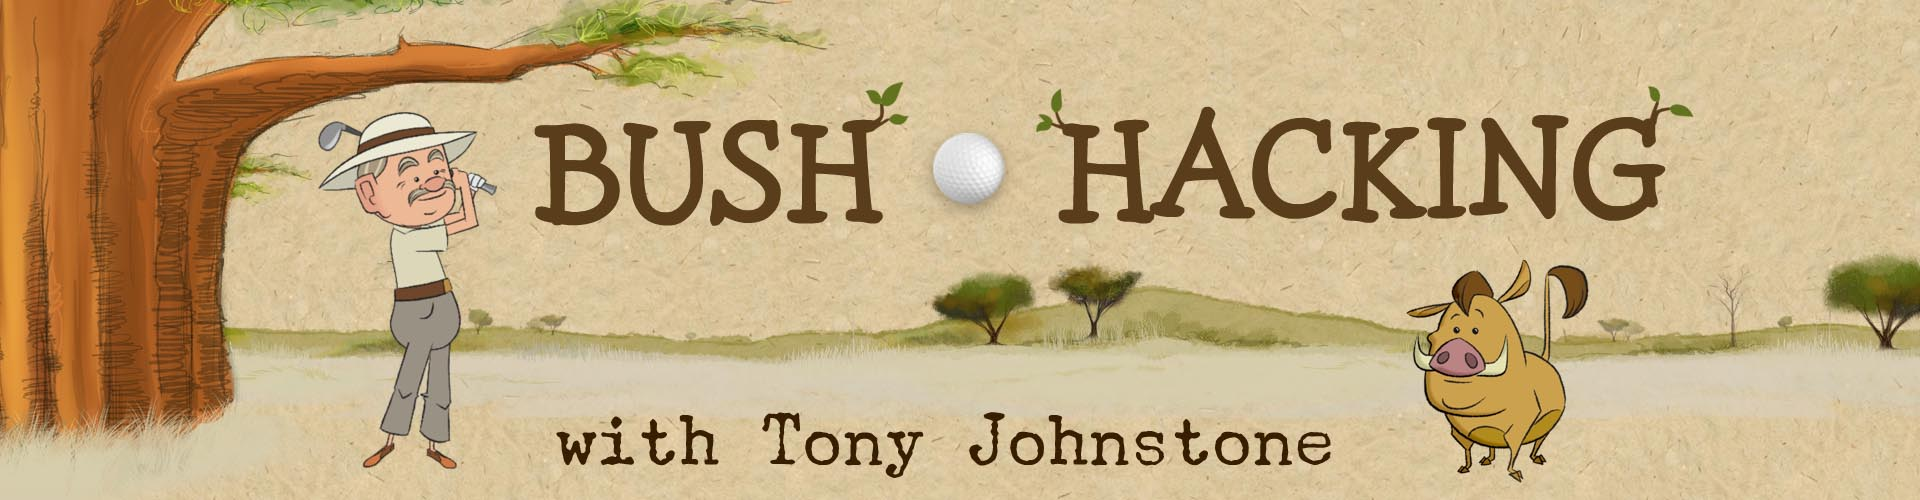 Bush Hacking with Tony Johnstone